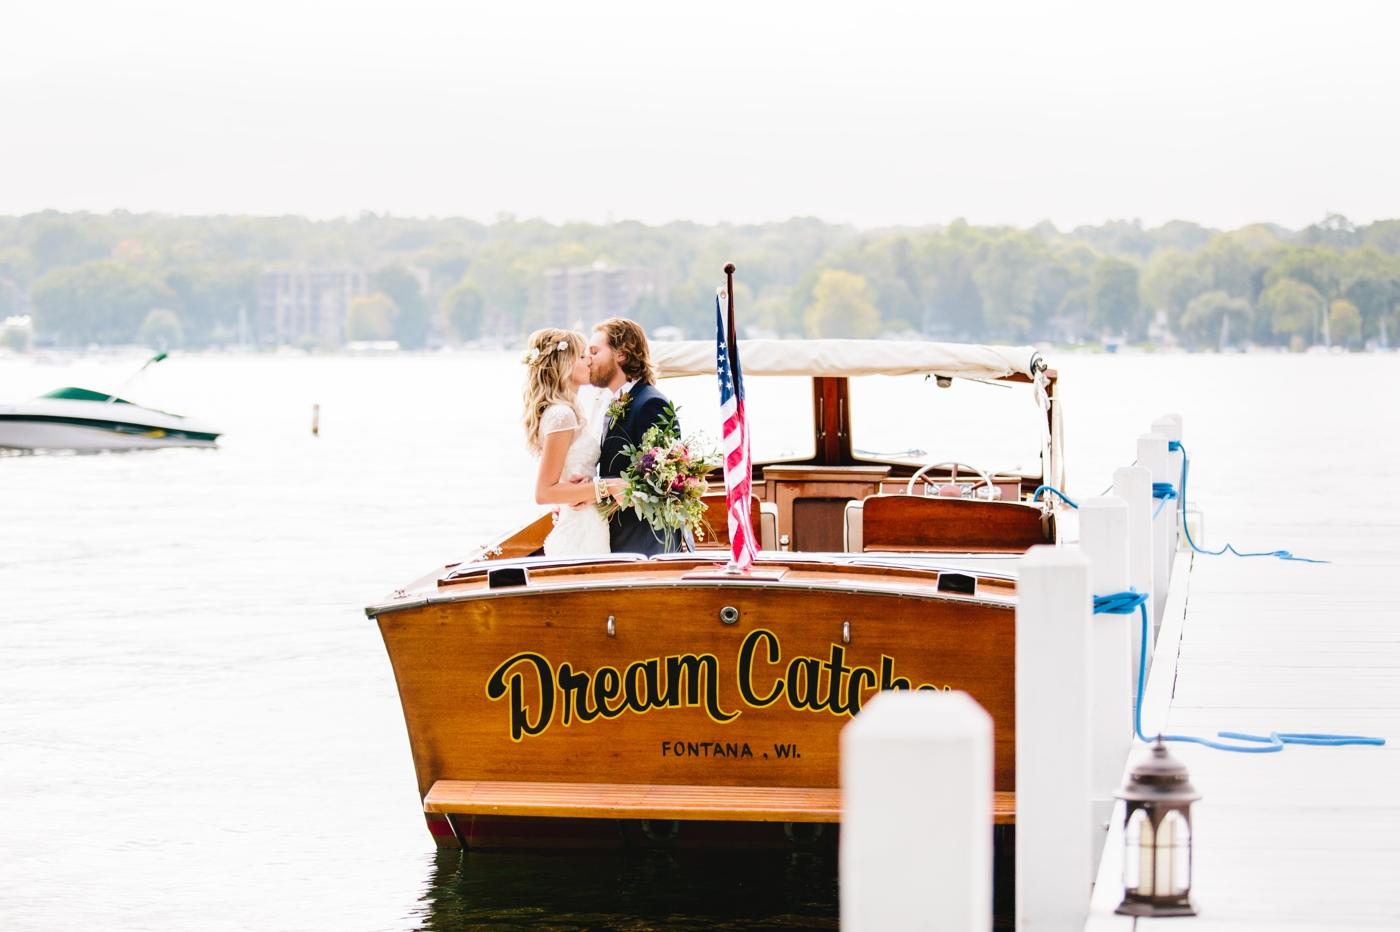 chicago-fine-art-wedding-photography-chriskelsey20